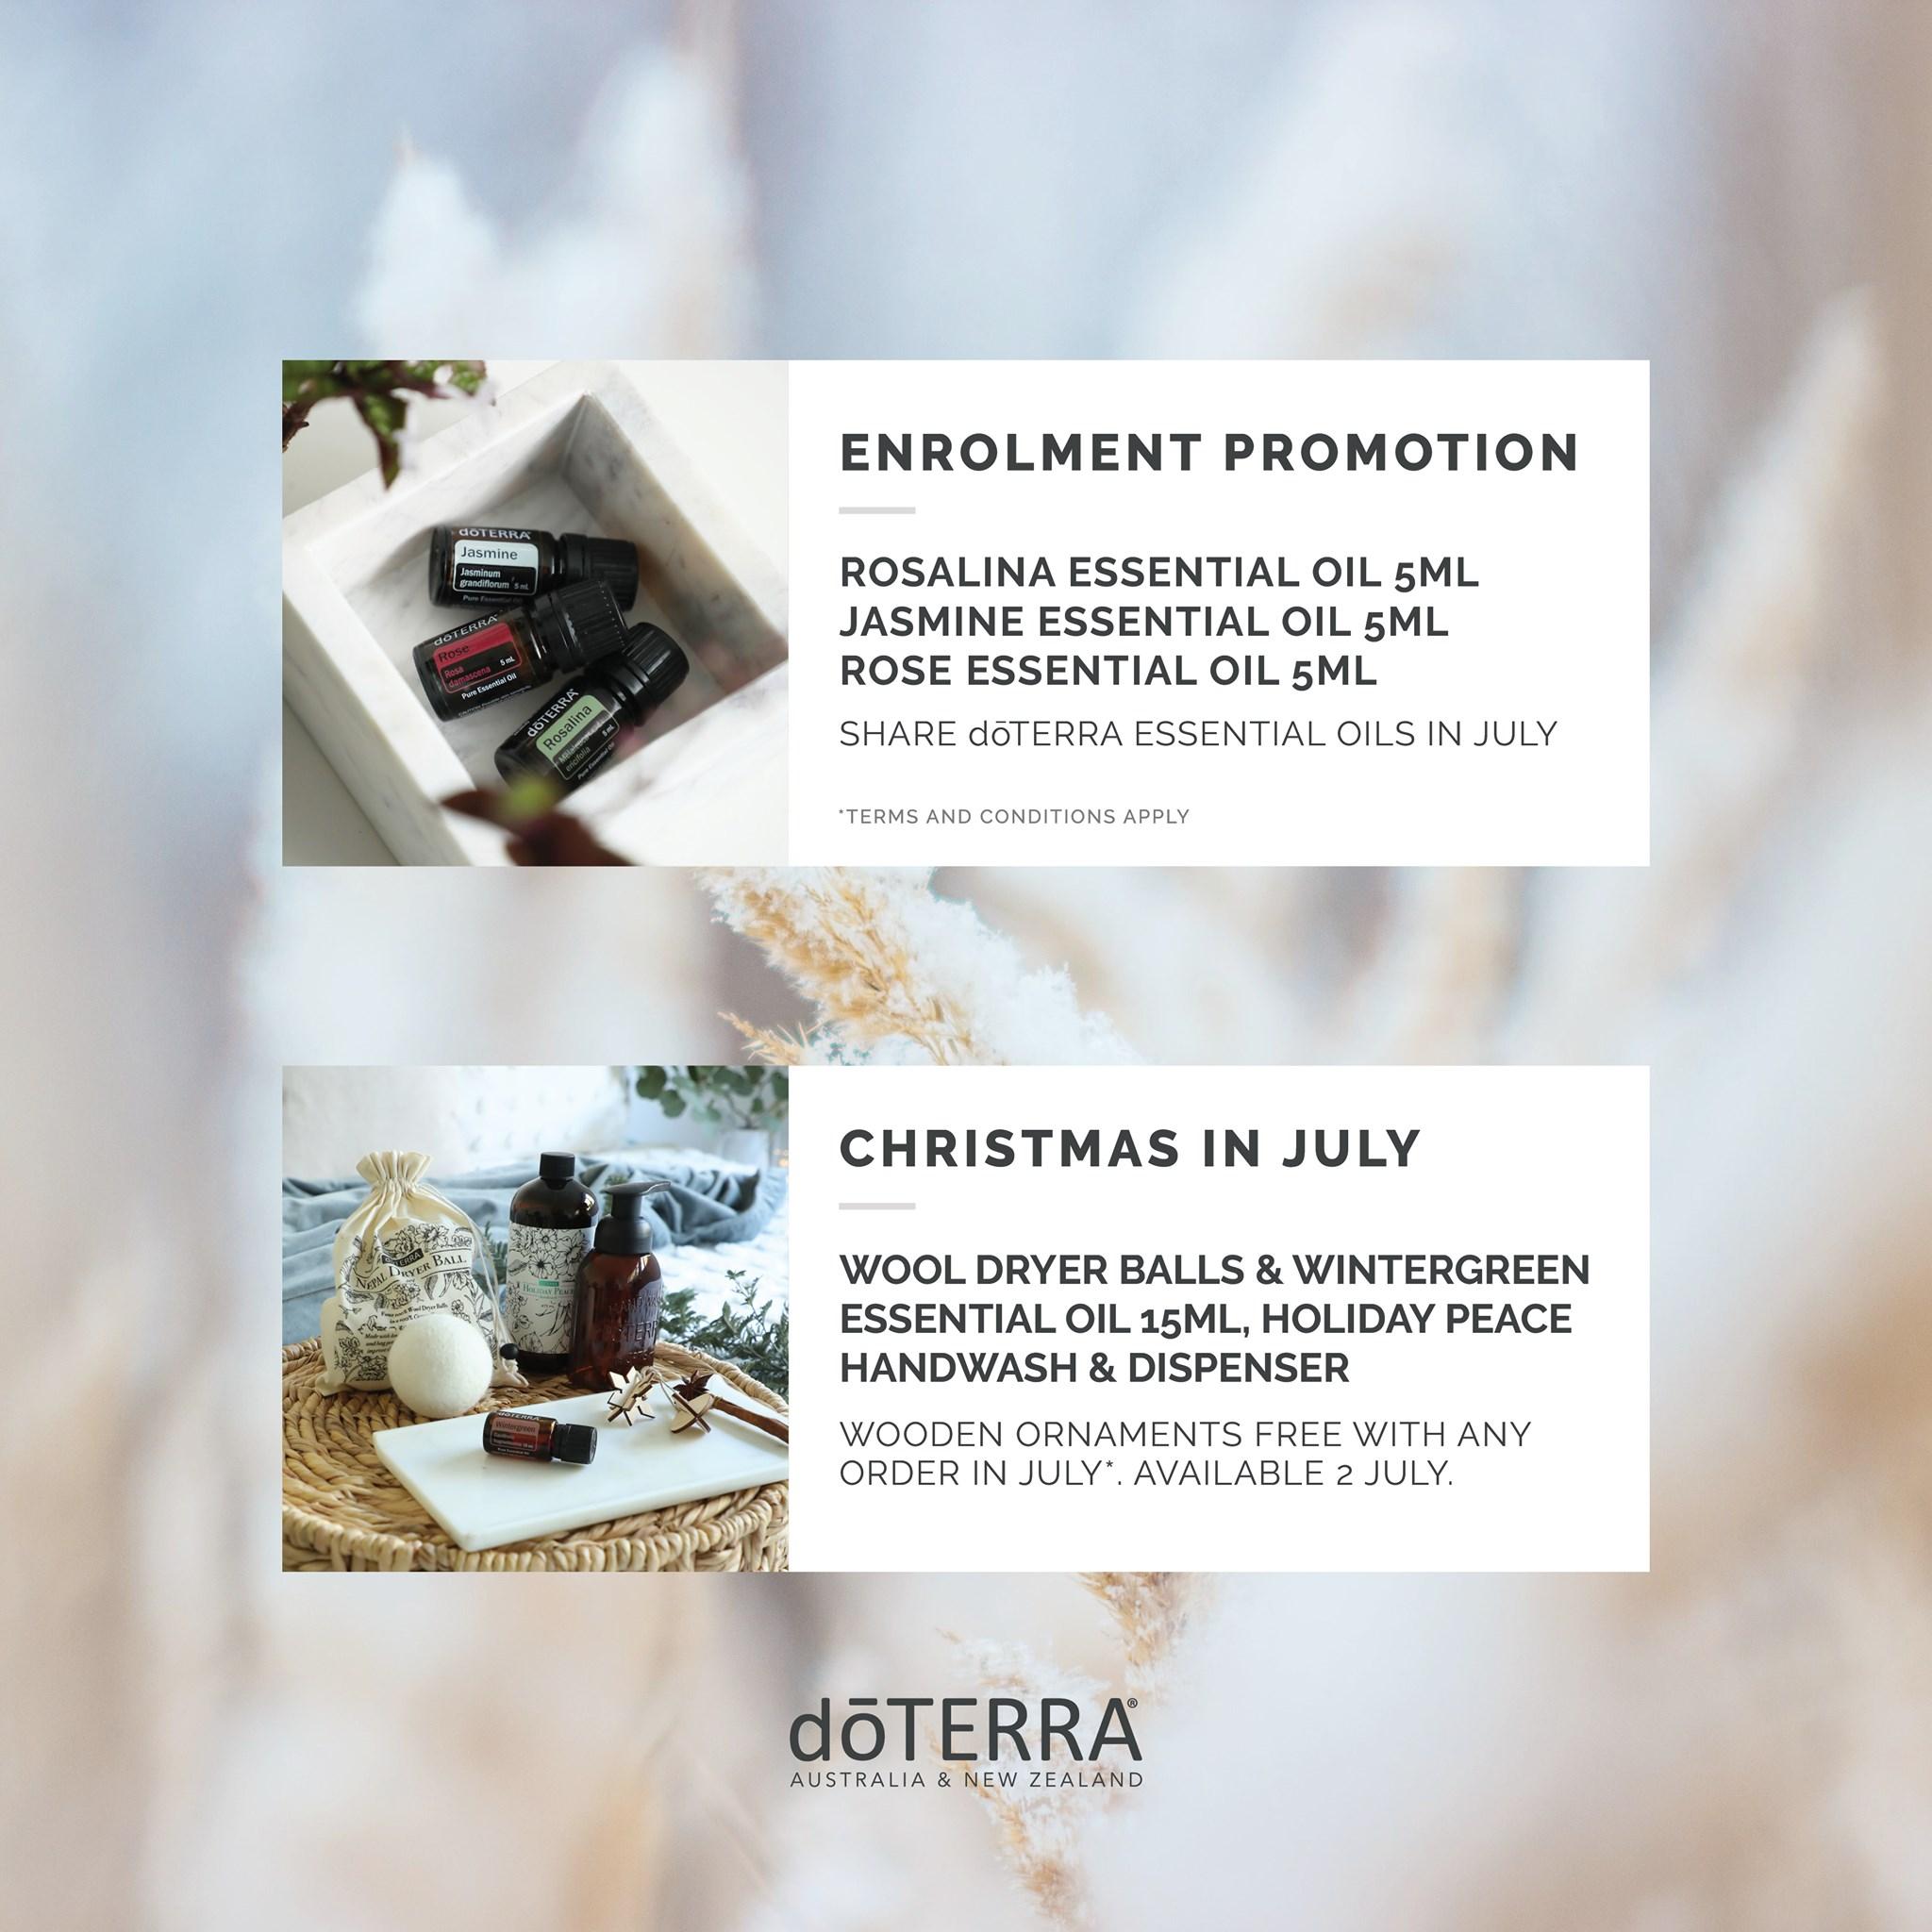 Doterra Christmas 2020 doTERRA's July 2020 Promotions   Ben Balden